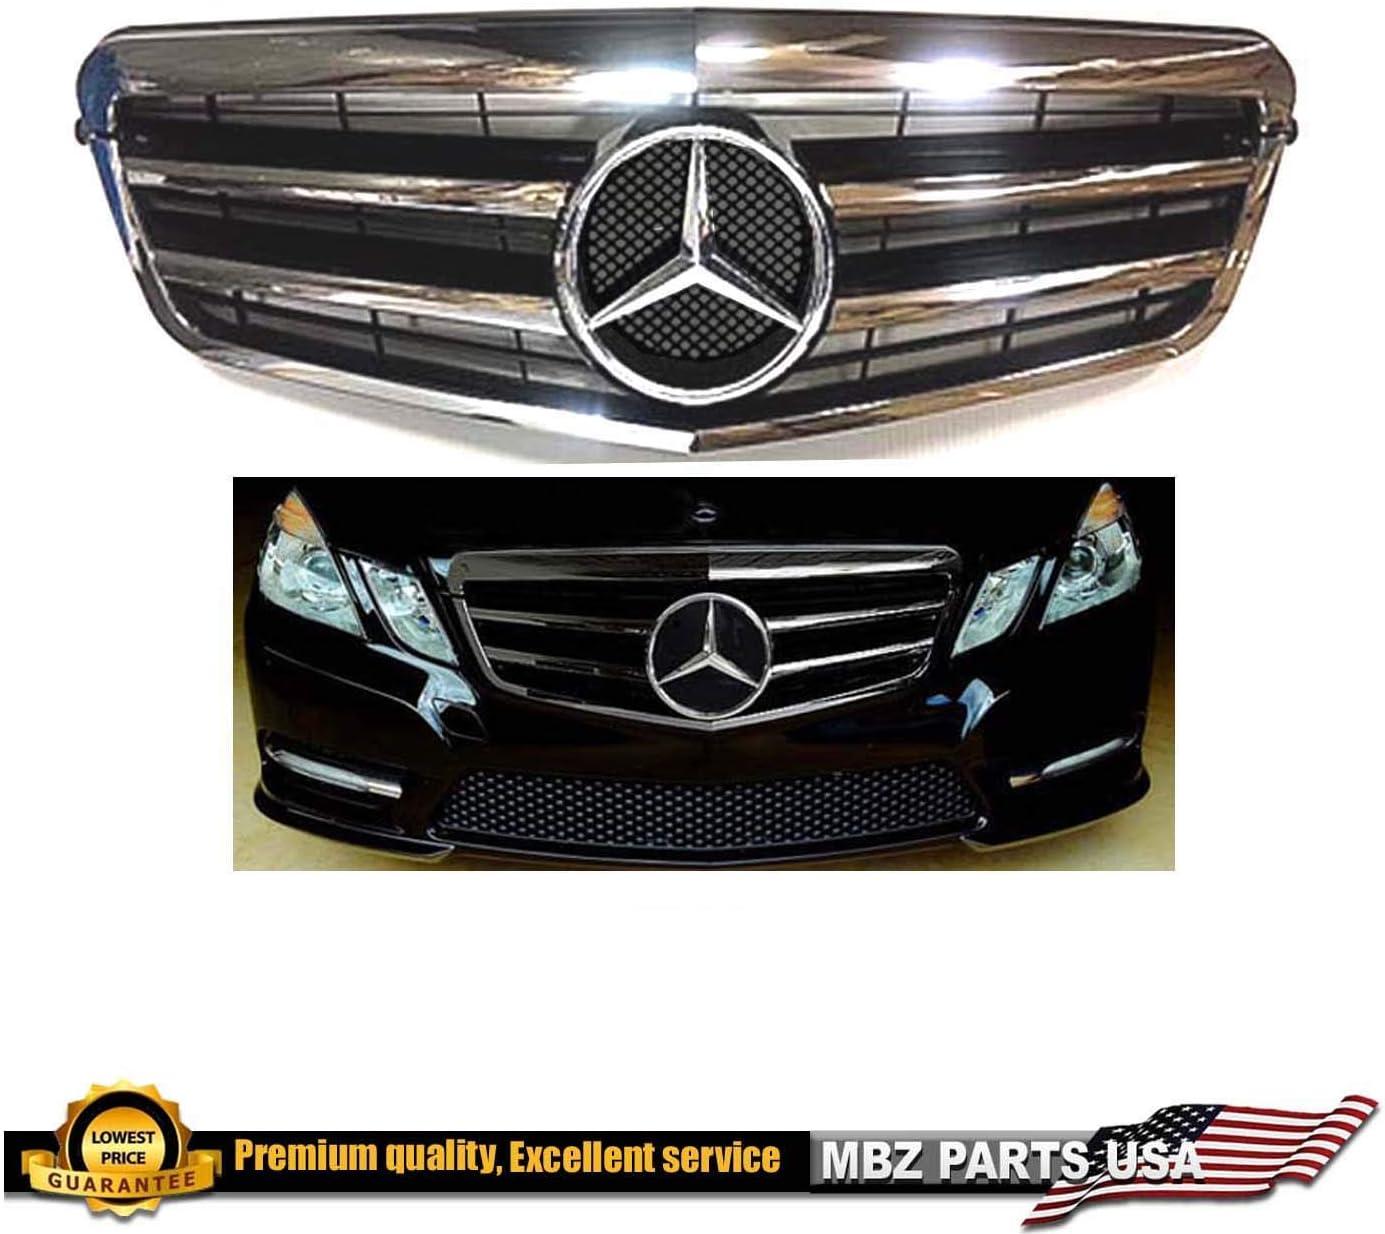 Mercedes Benz E350 E550 2010 2011 2012 2013 Genuine Mercedes Bumper Cover Grille